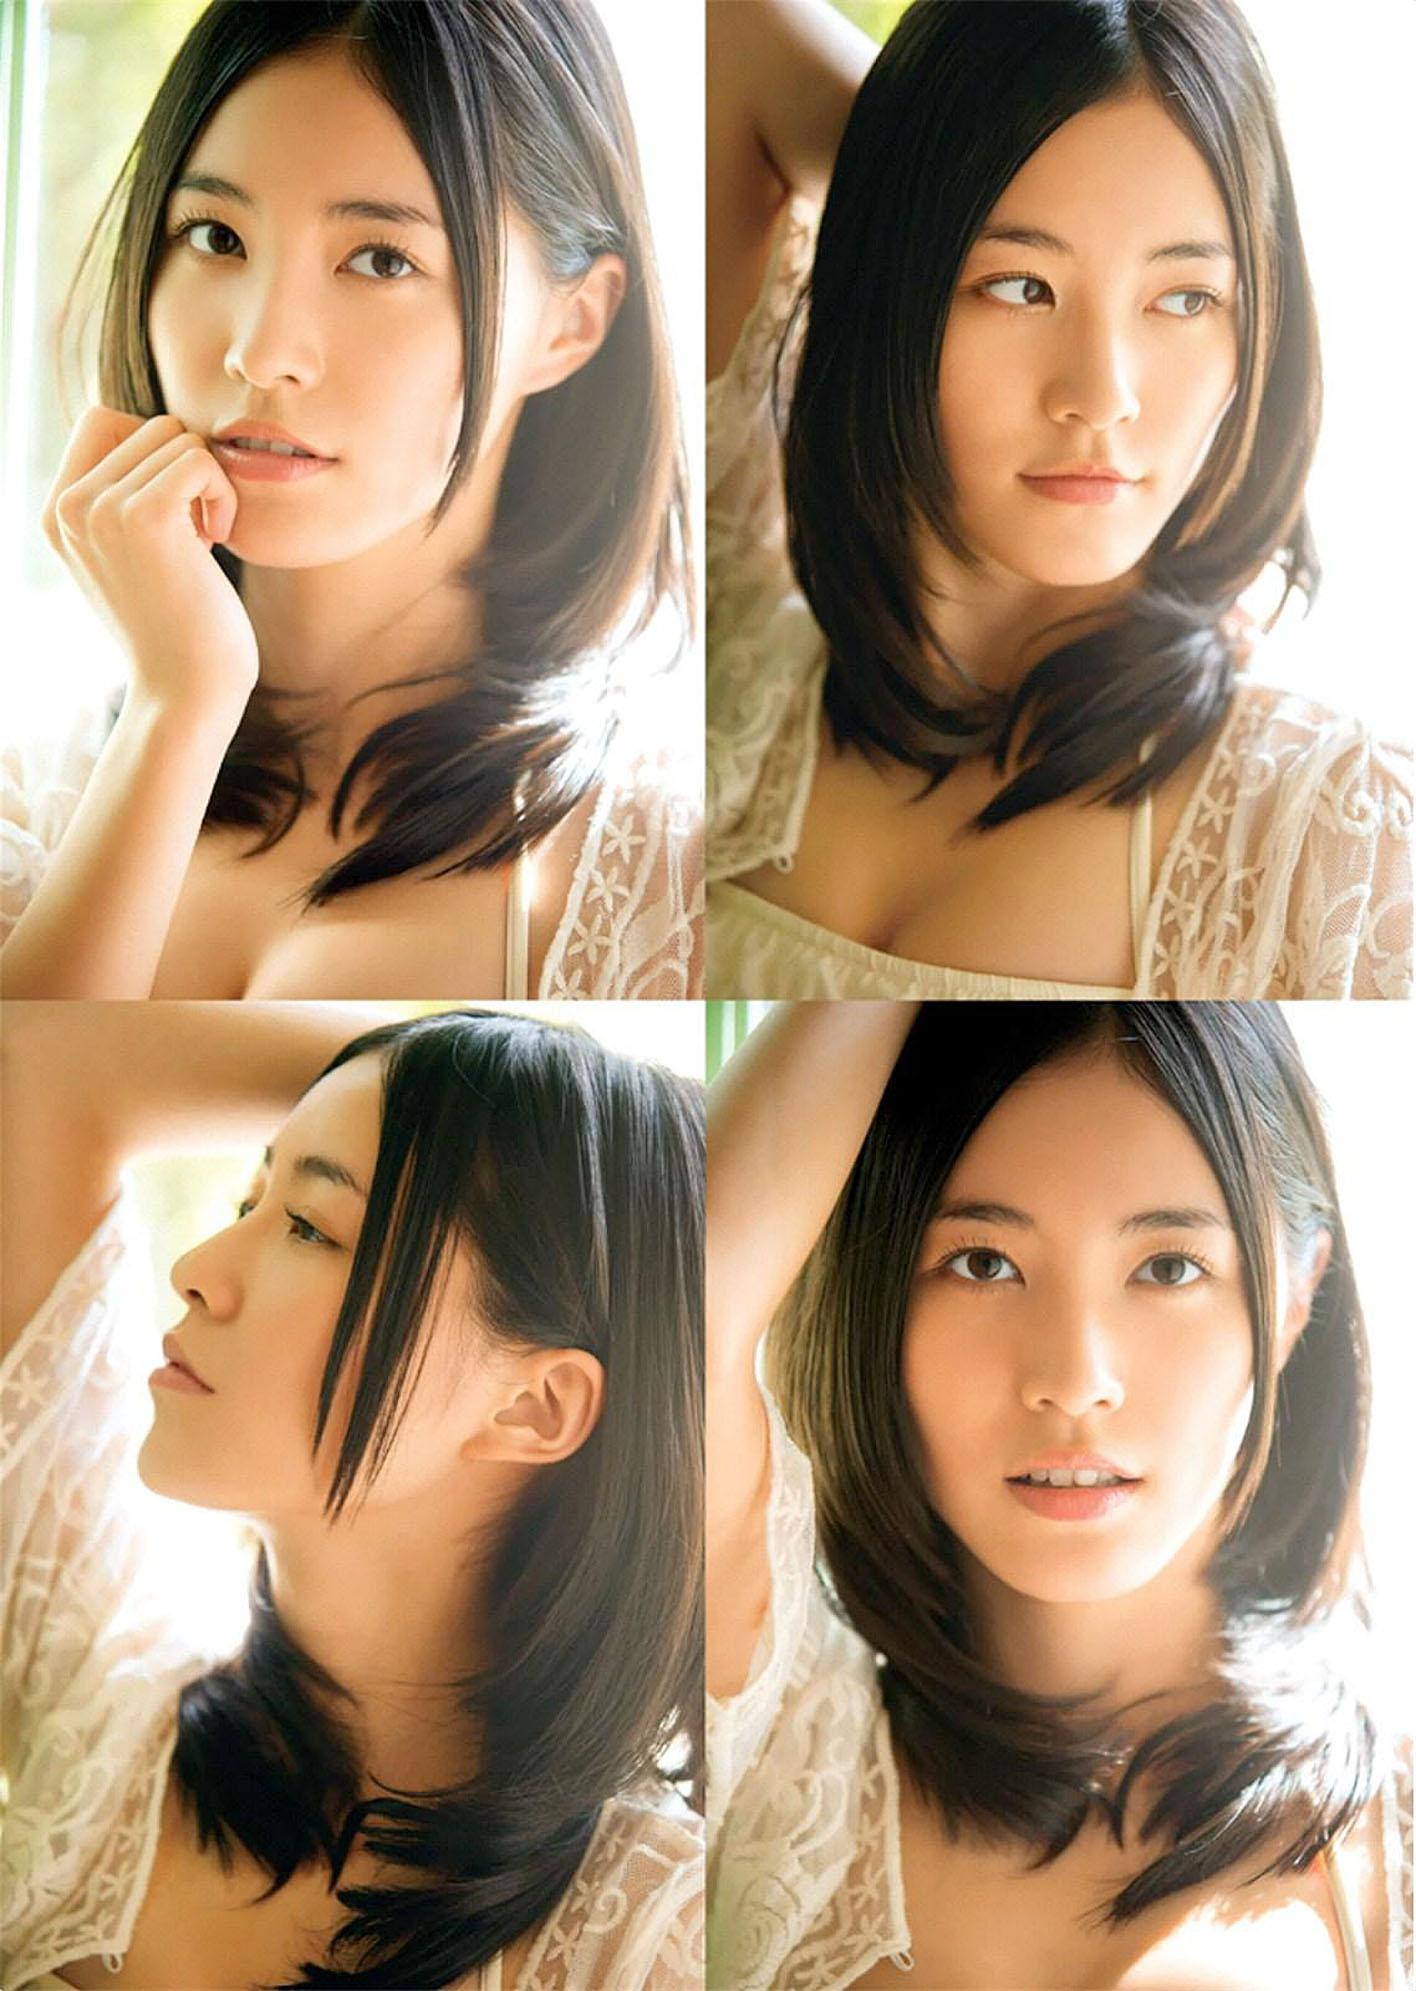 MJurina Manga Action 141216 07.jpg